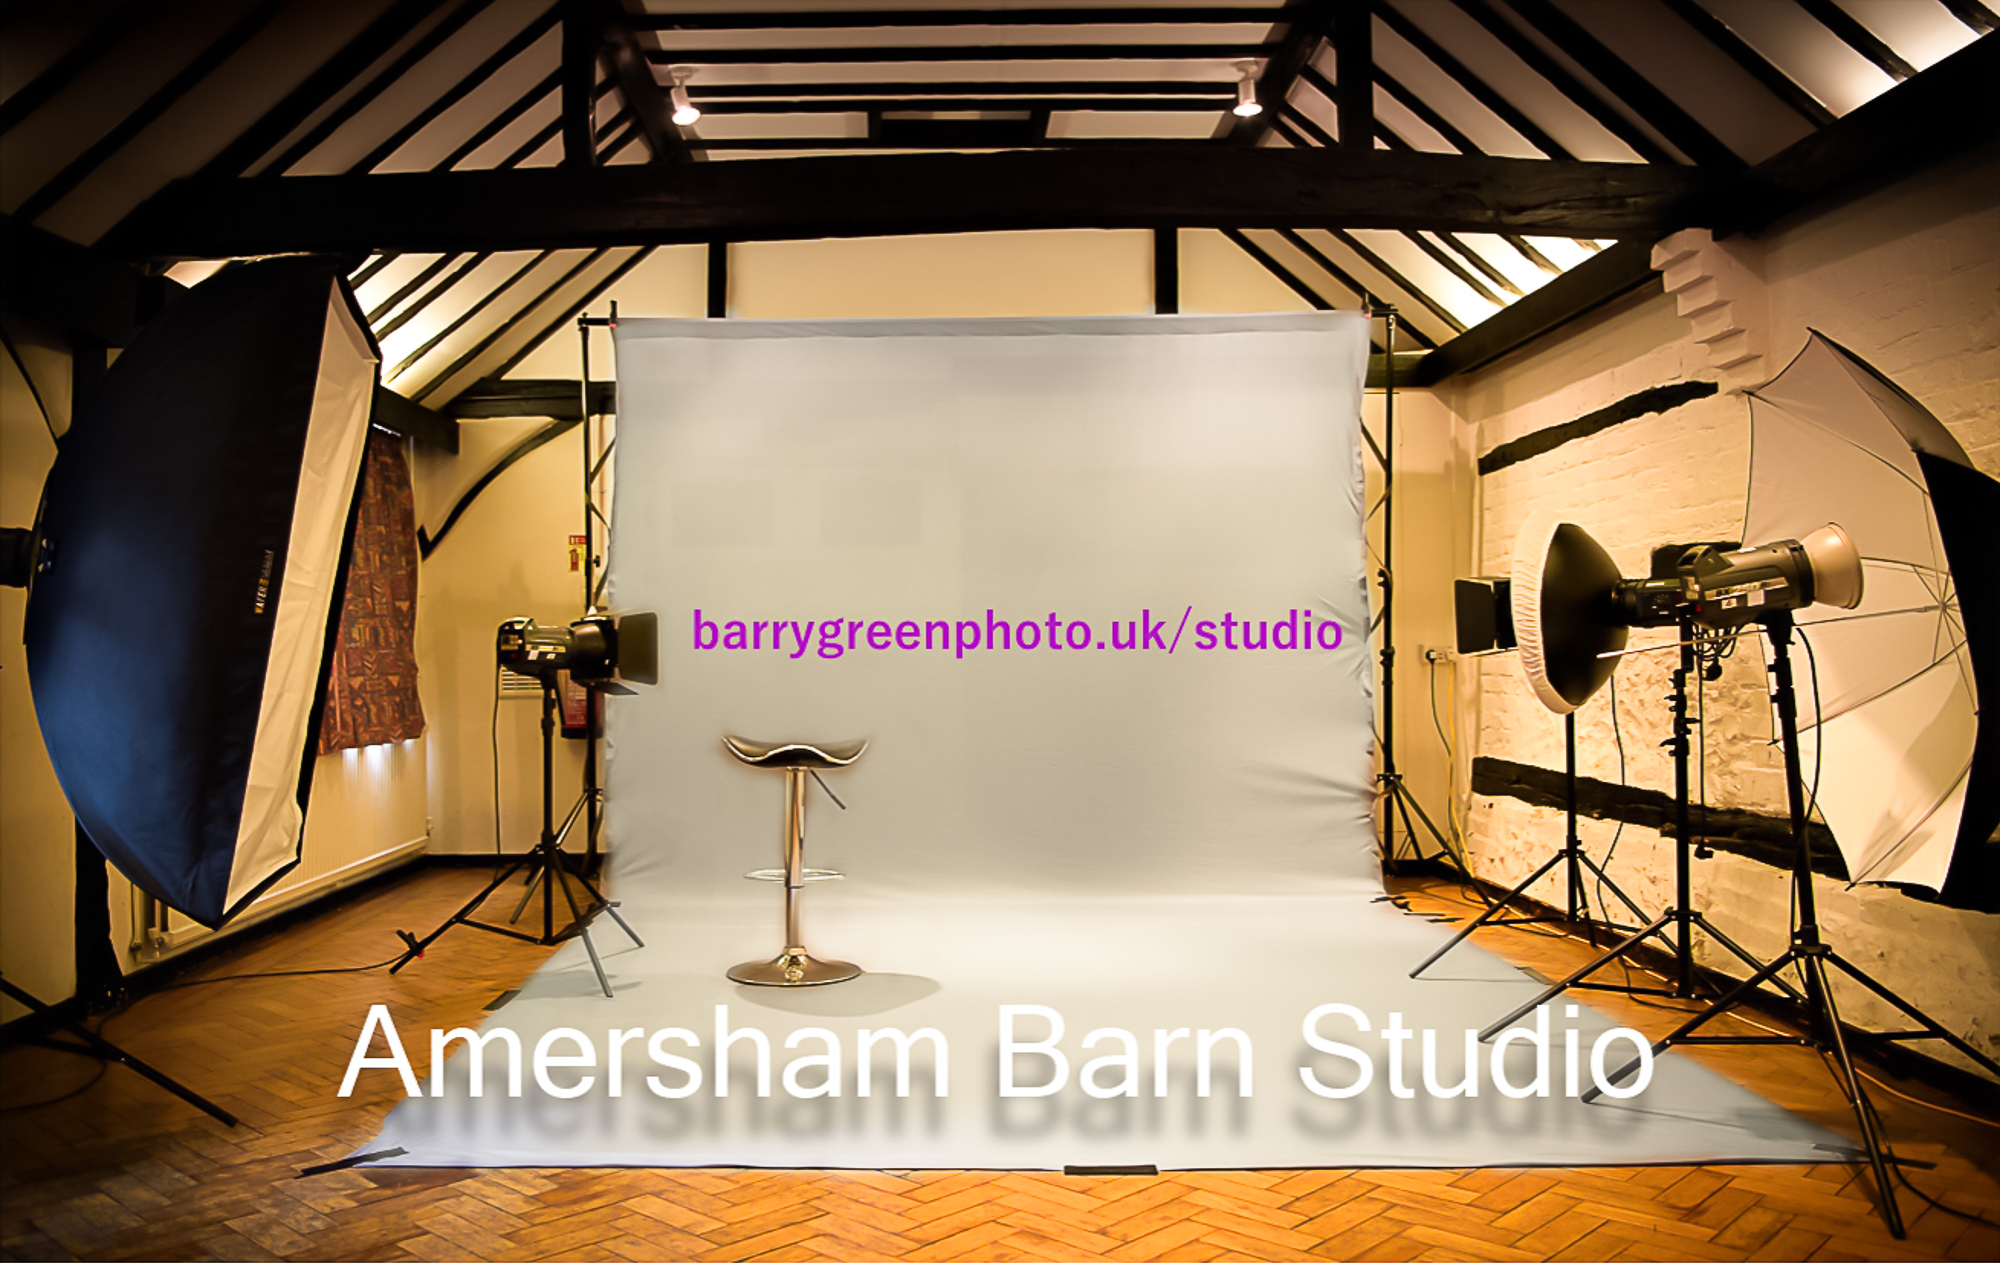 Amersham Barn Studio